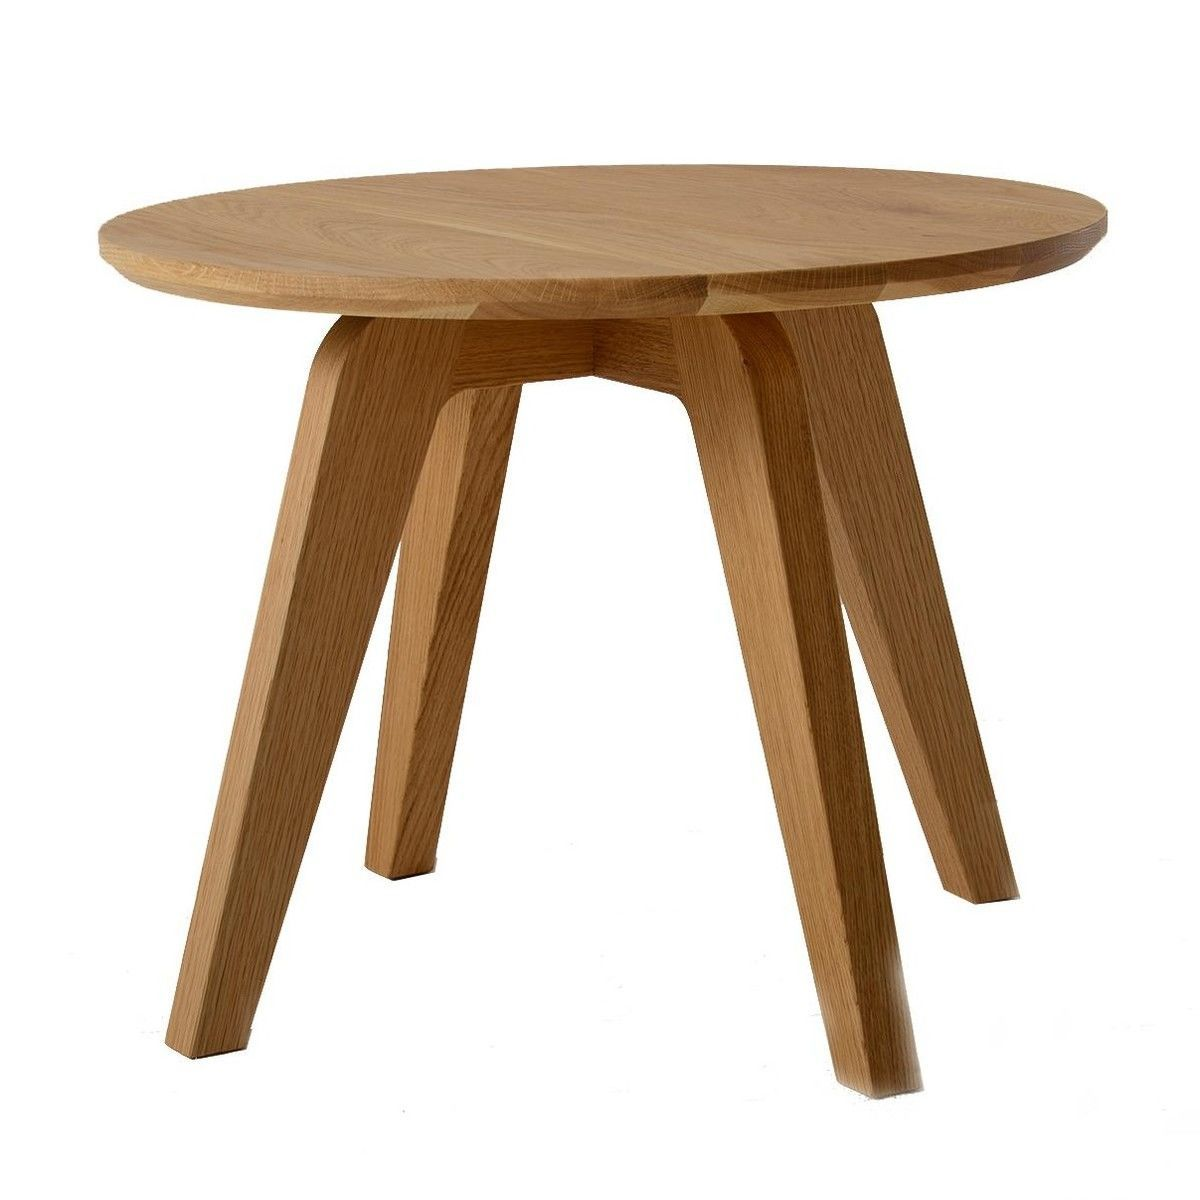 dweller solid wood side table  jan kurtz  ambientedirectcom - jan kurtz  dweller solid wood side table  natural oakxcm